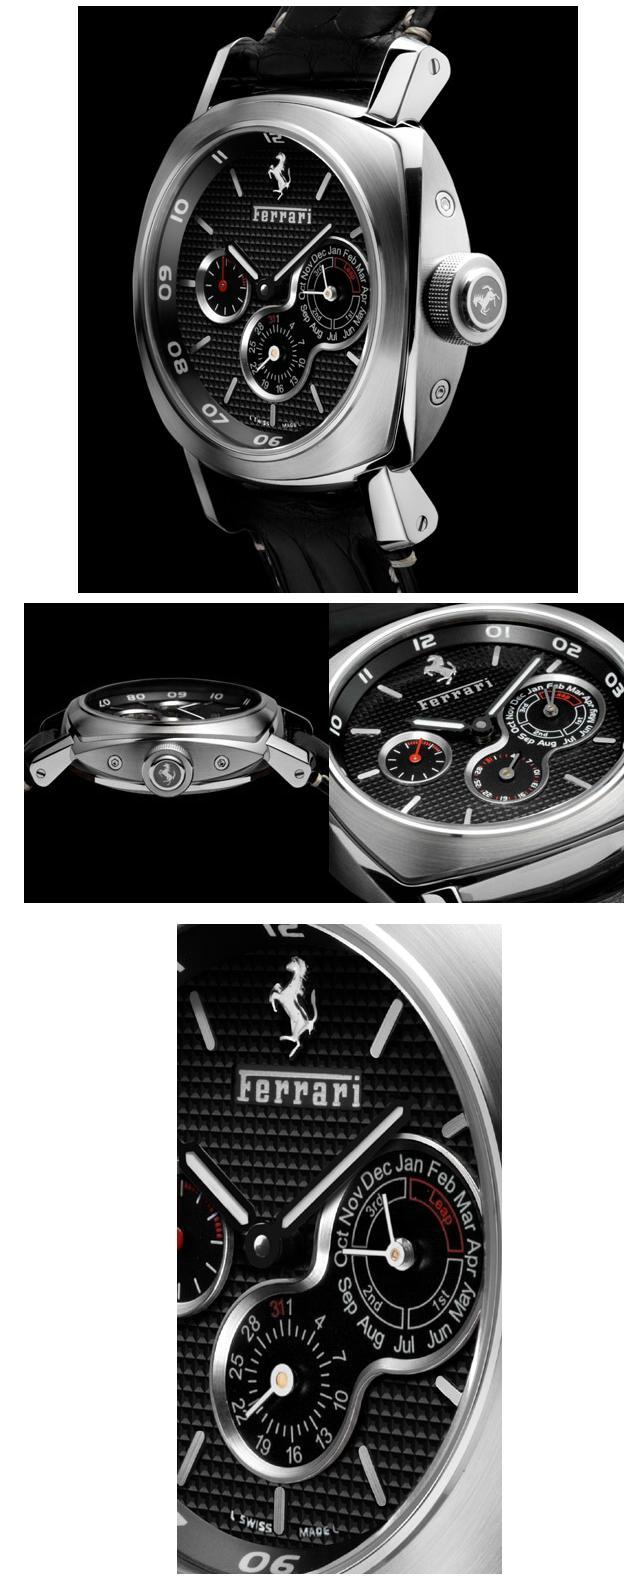 News : Panerai Calendrier Perpétuel pour Ferrari Qppan